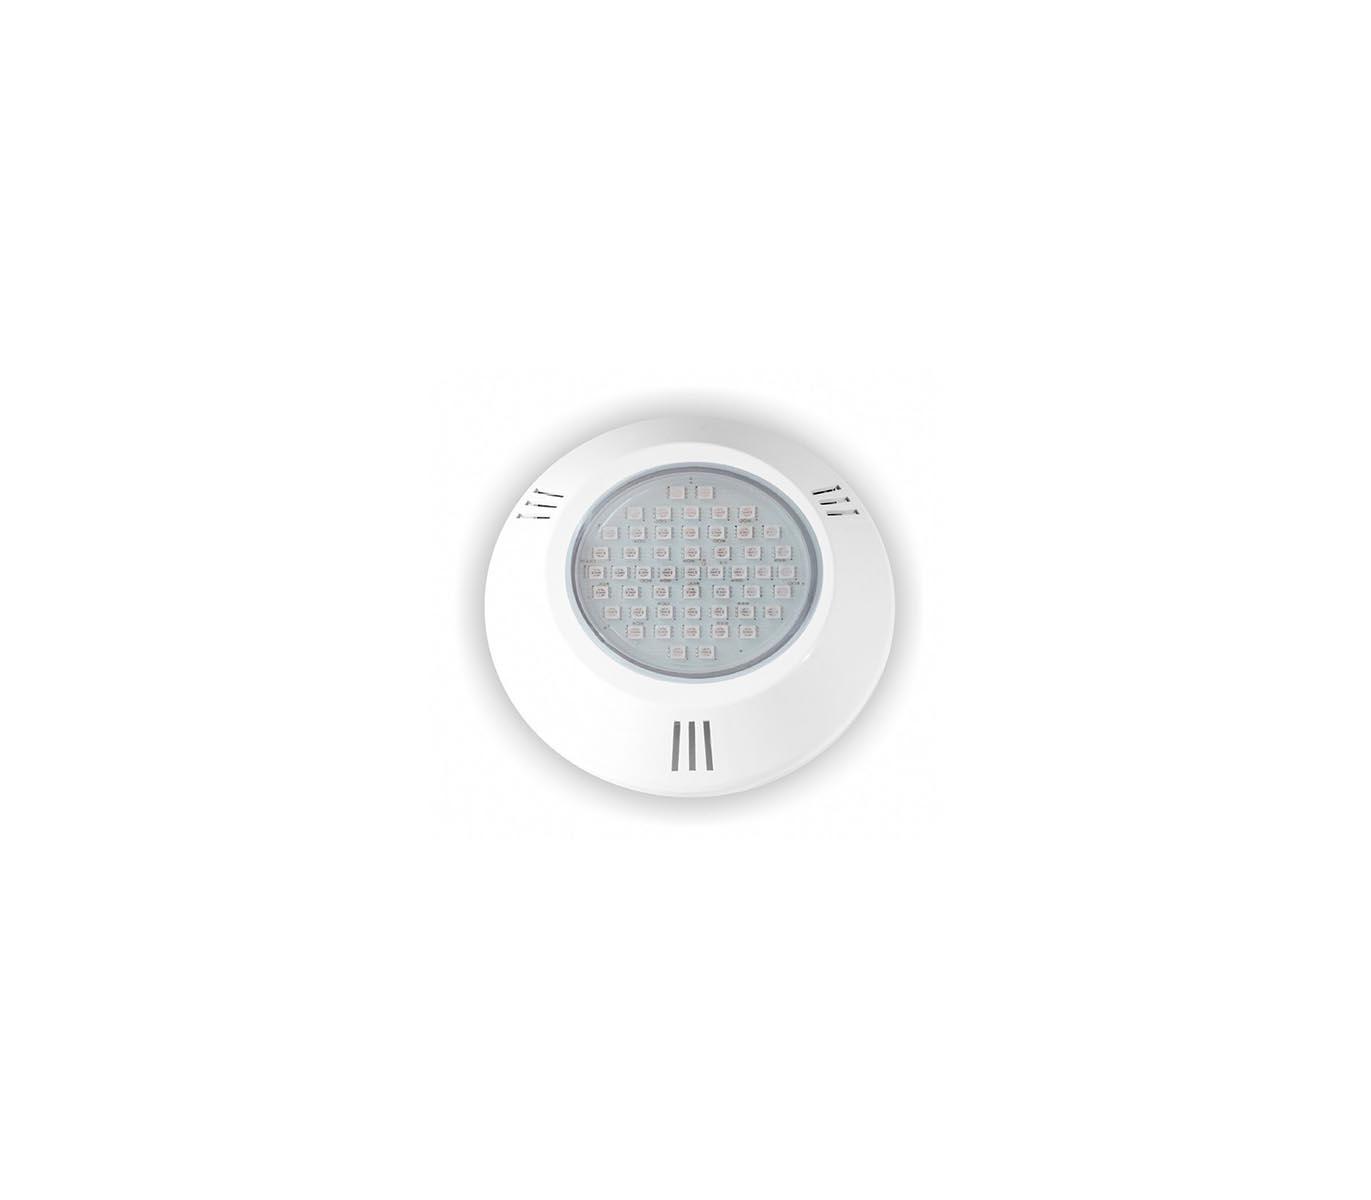 Refletor Power LED 9W ABS RGB Rosca Brustec